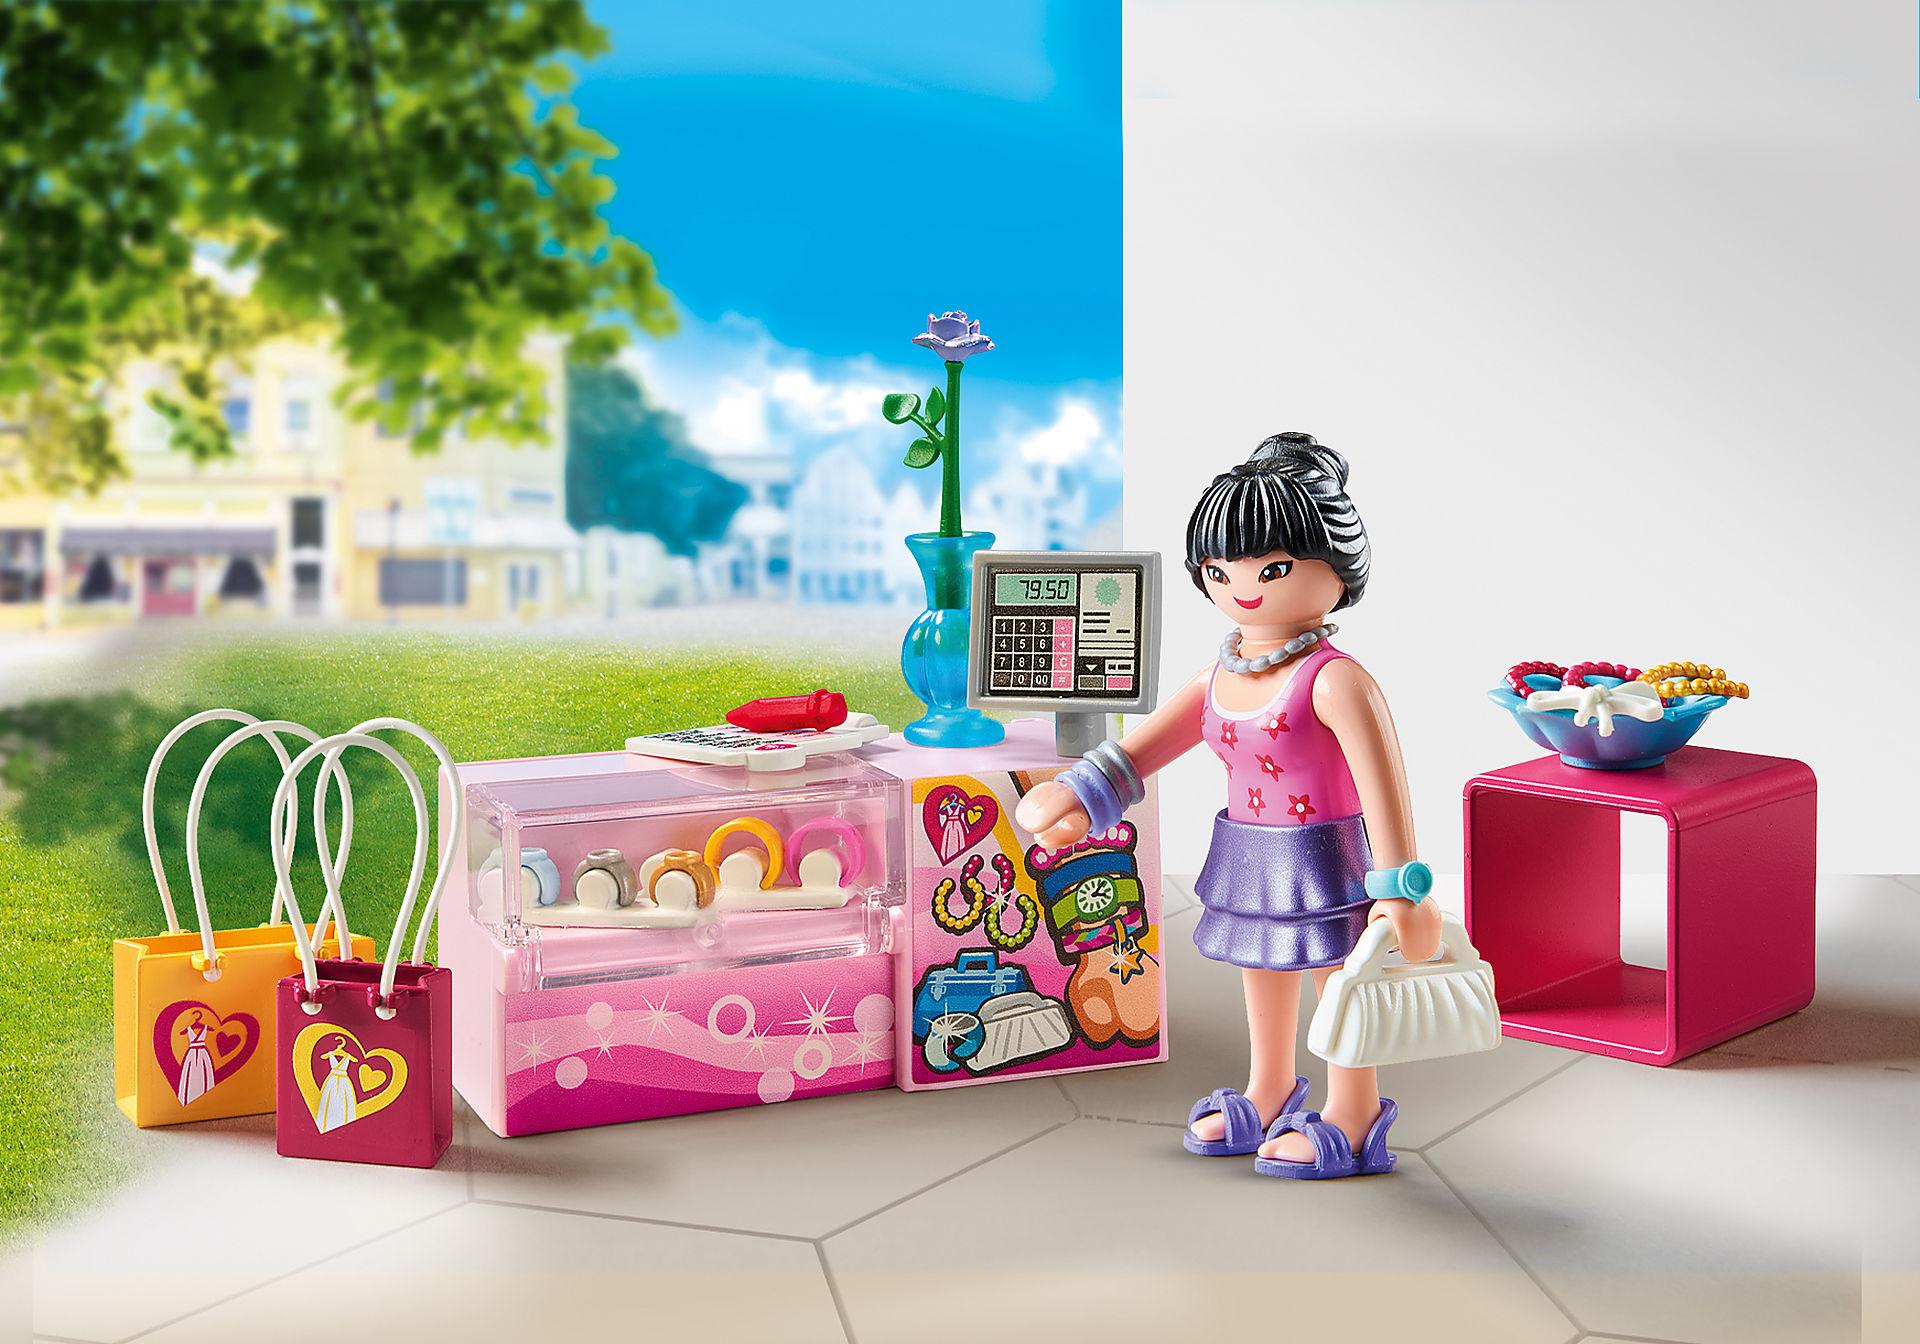 70594 Fashion Accessoires zoom image1